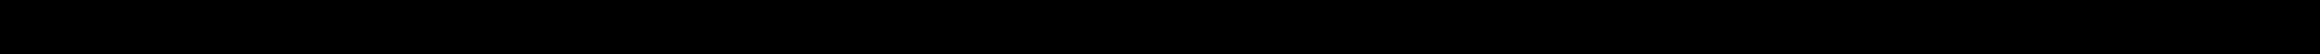 SIDEM Part of, 201 352 00 27, 204 352 00 27, 220 352 00 27, 220 352 02 27 Tukivarren hela